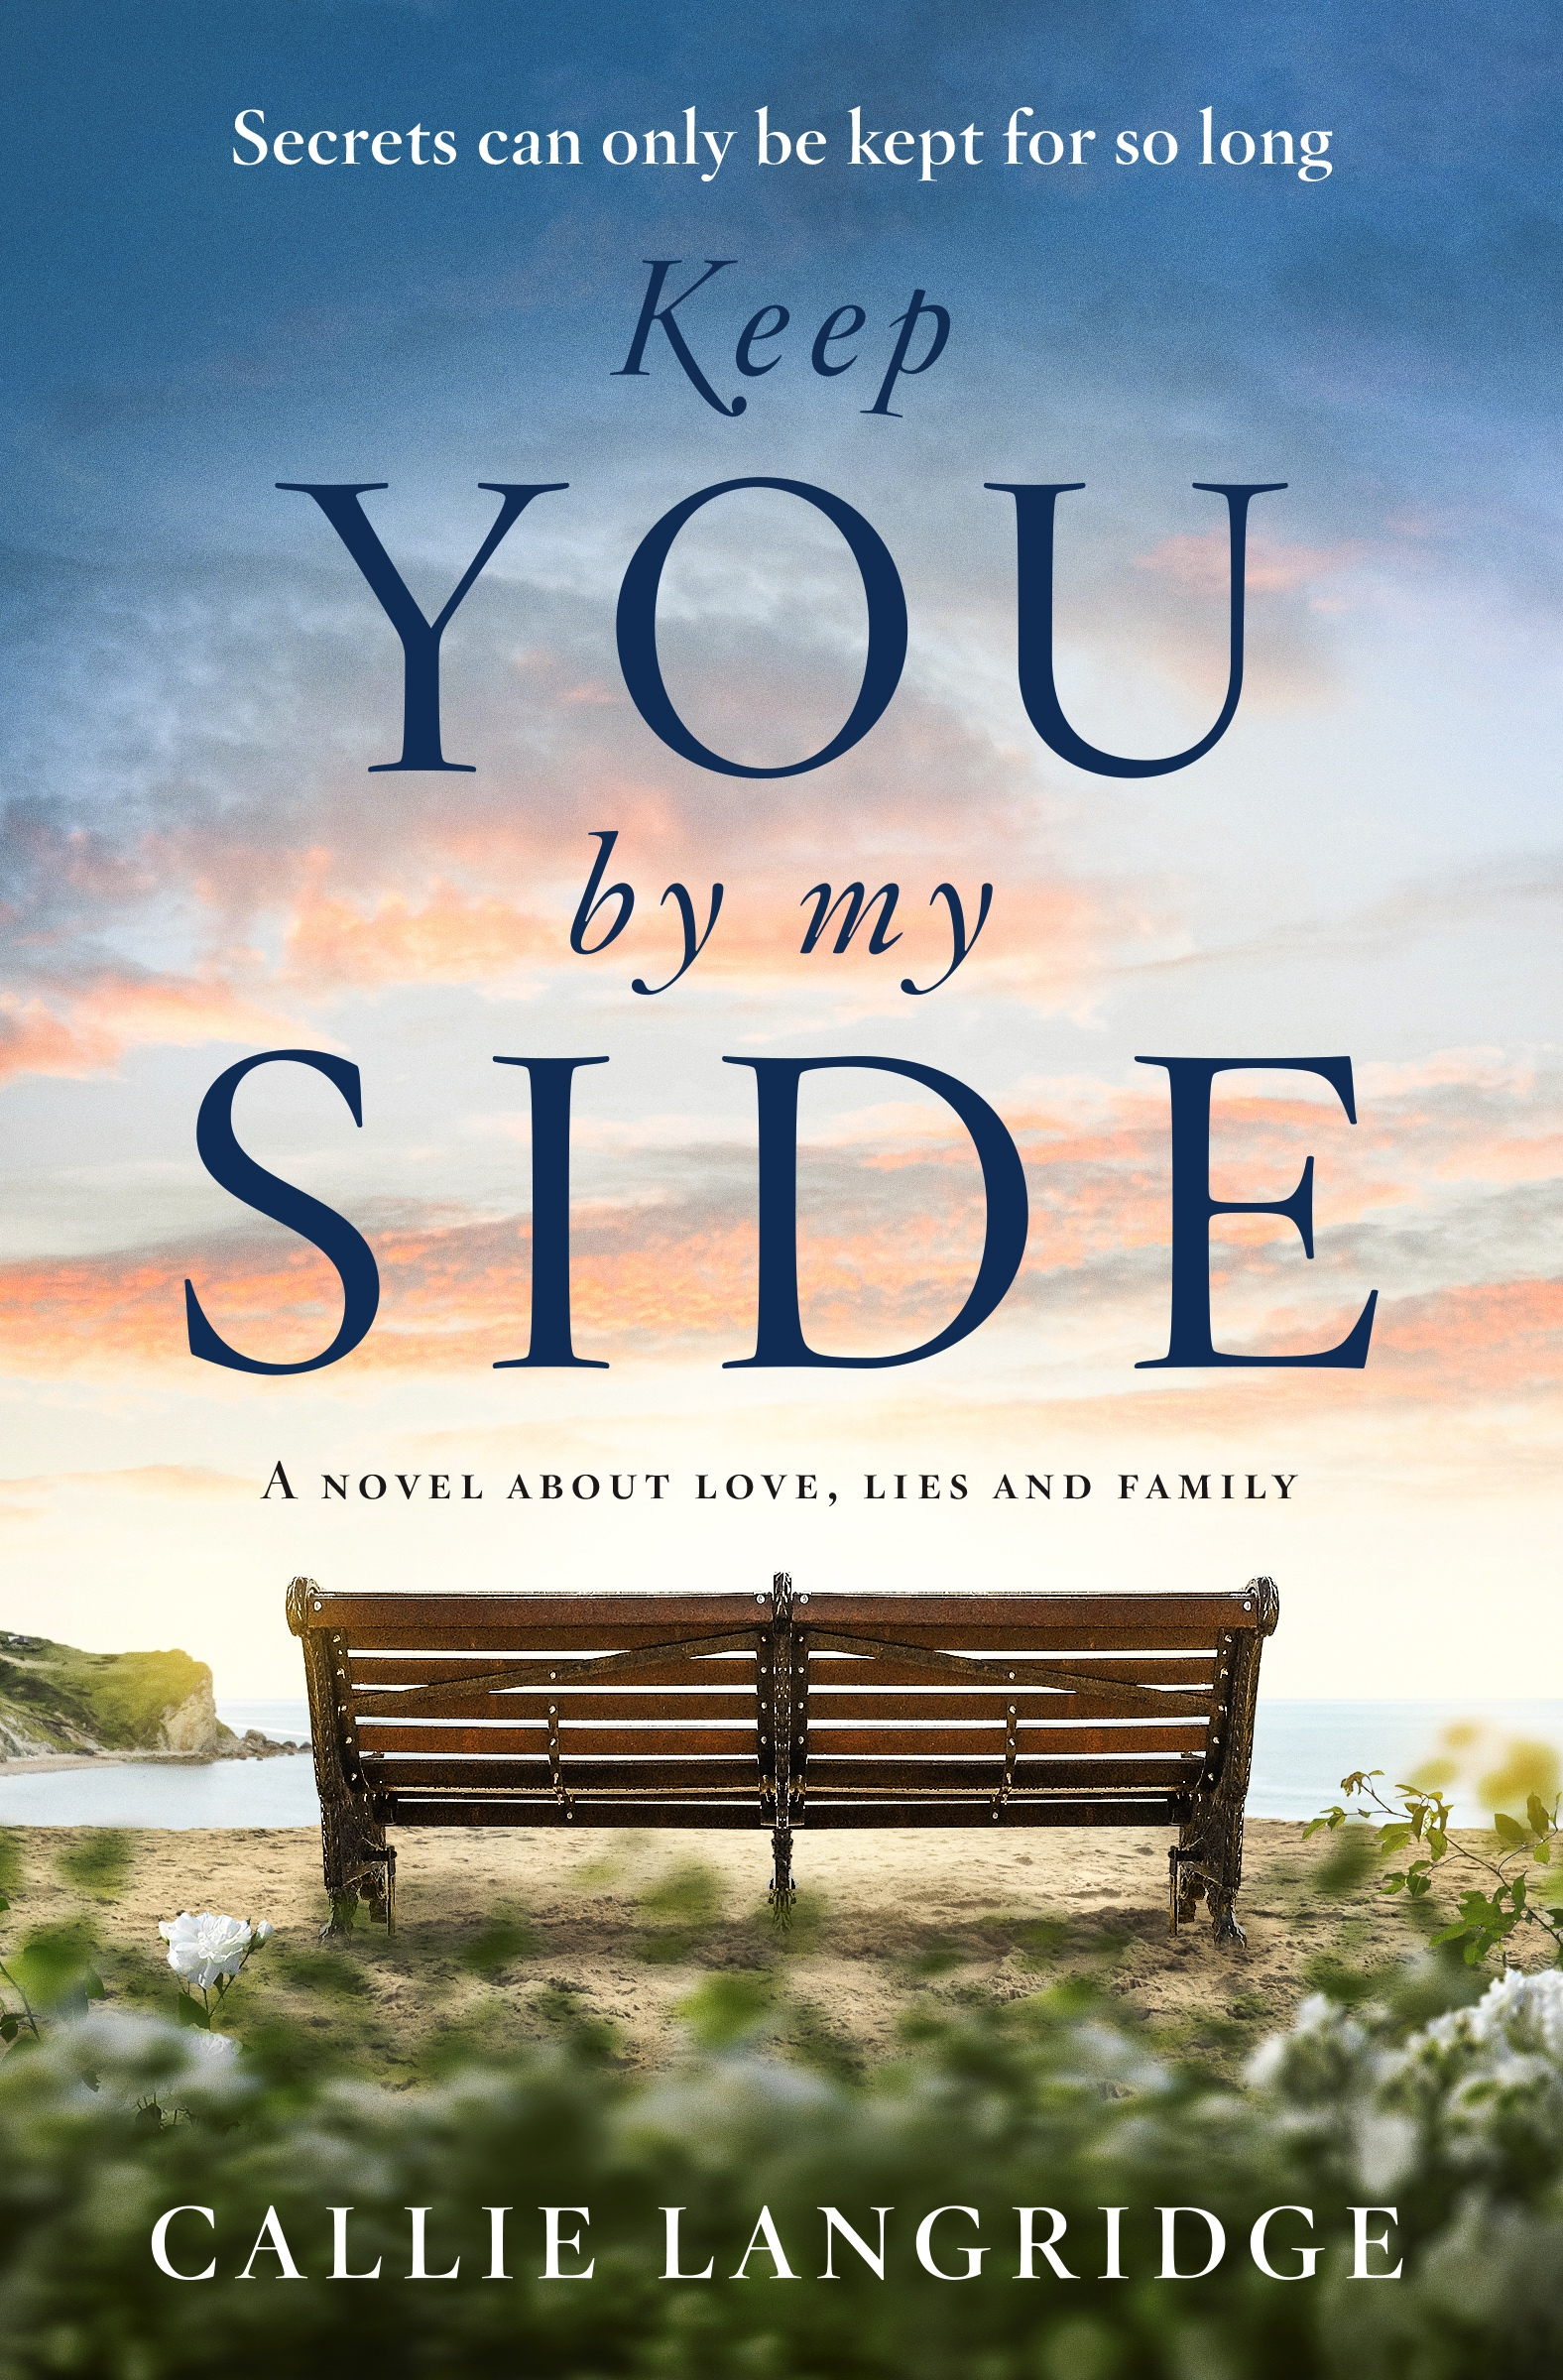 Keep-You-By-My-Side-Kindle.jpg